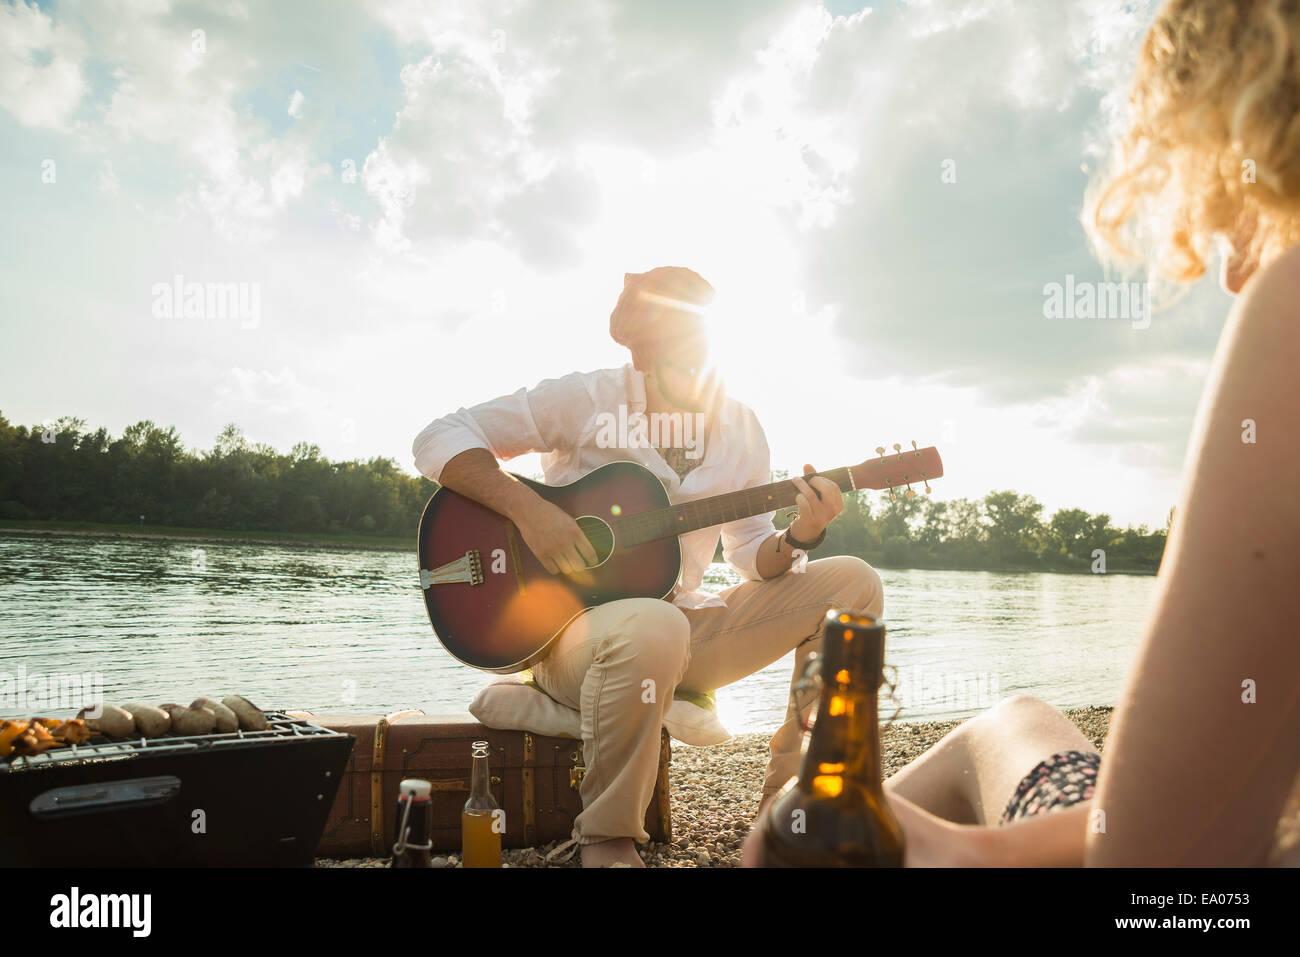 Young man sitting by lake playing guitar - Stock Image